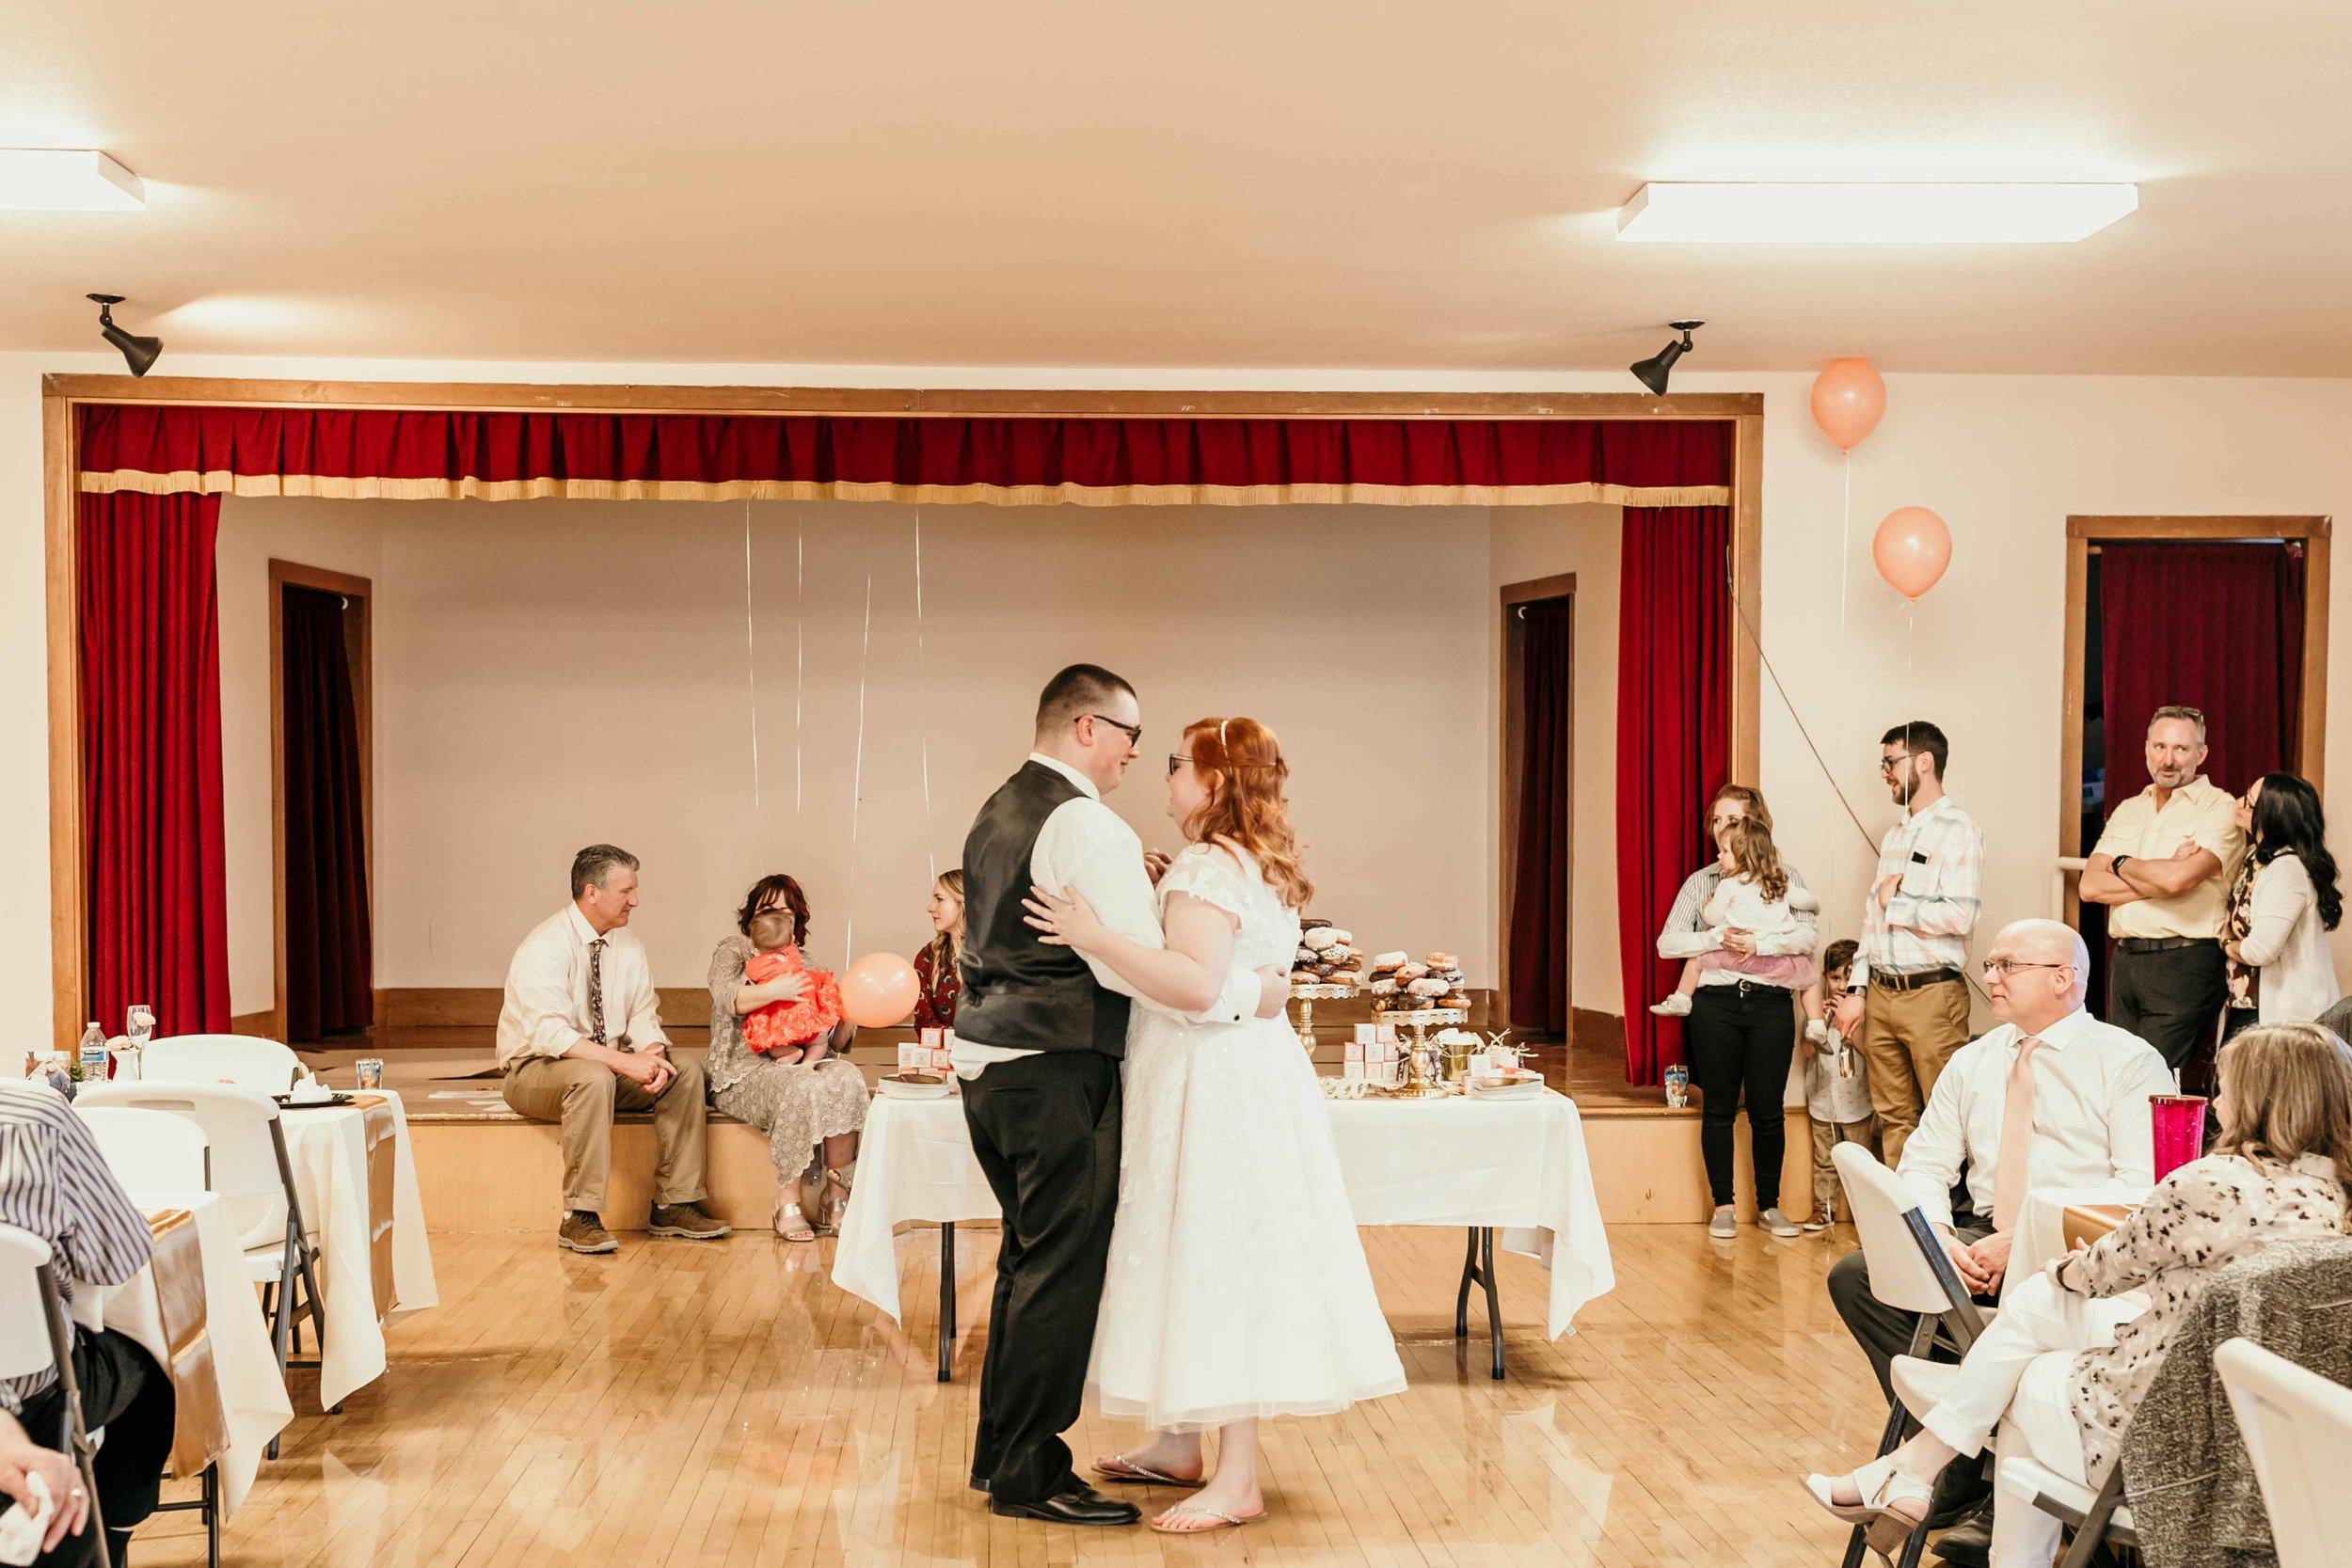 richland-wedding-photographer-84.jpg